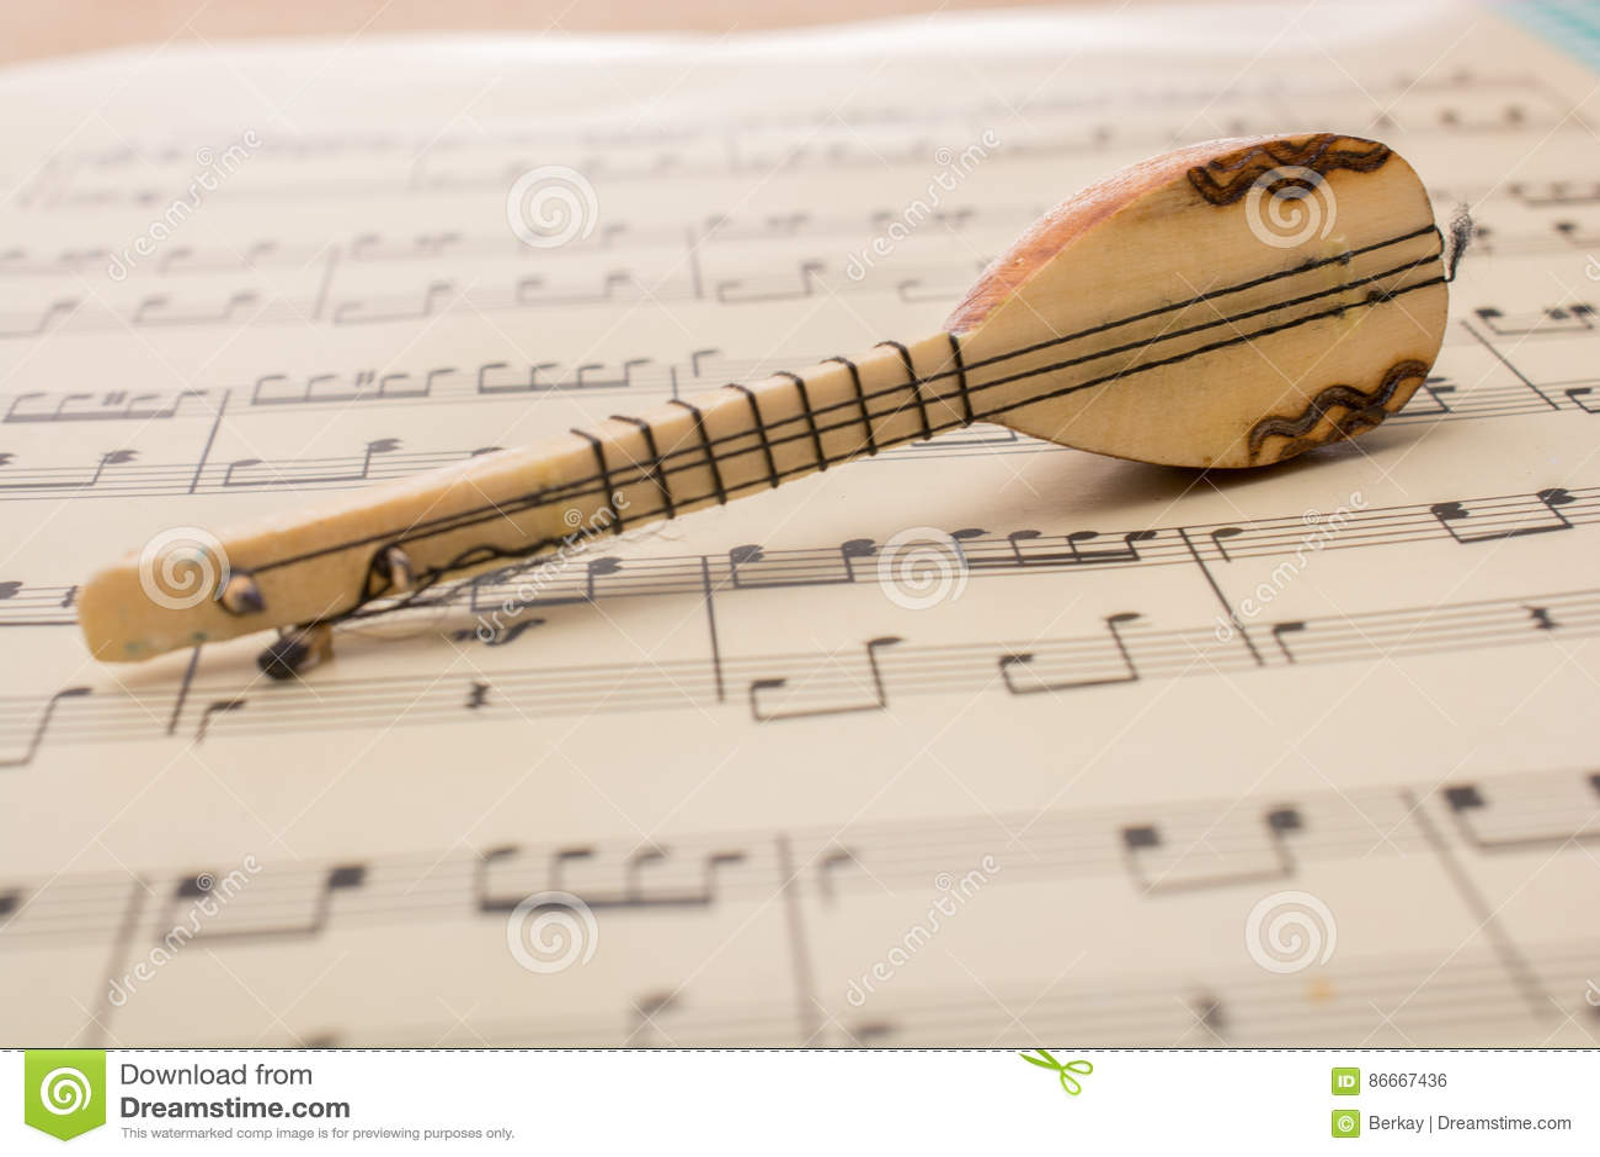 music turkish saz